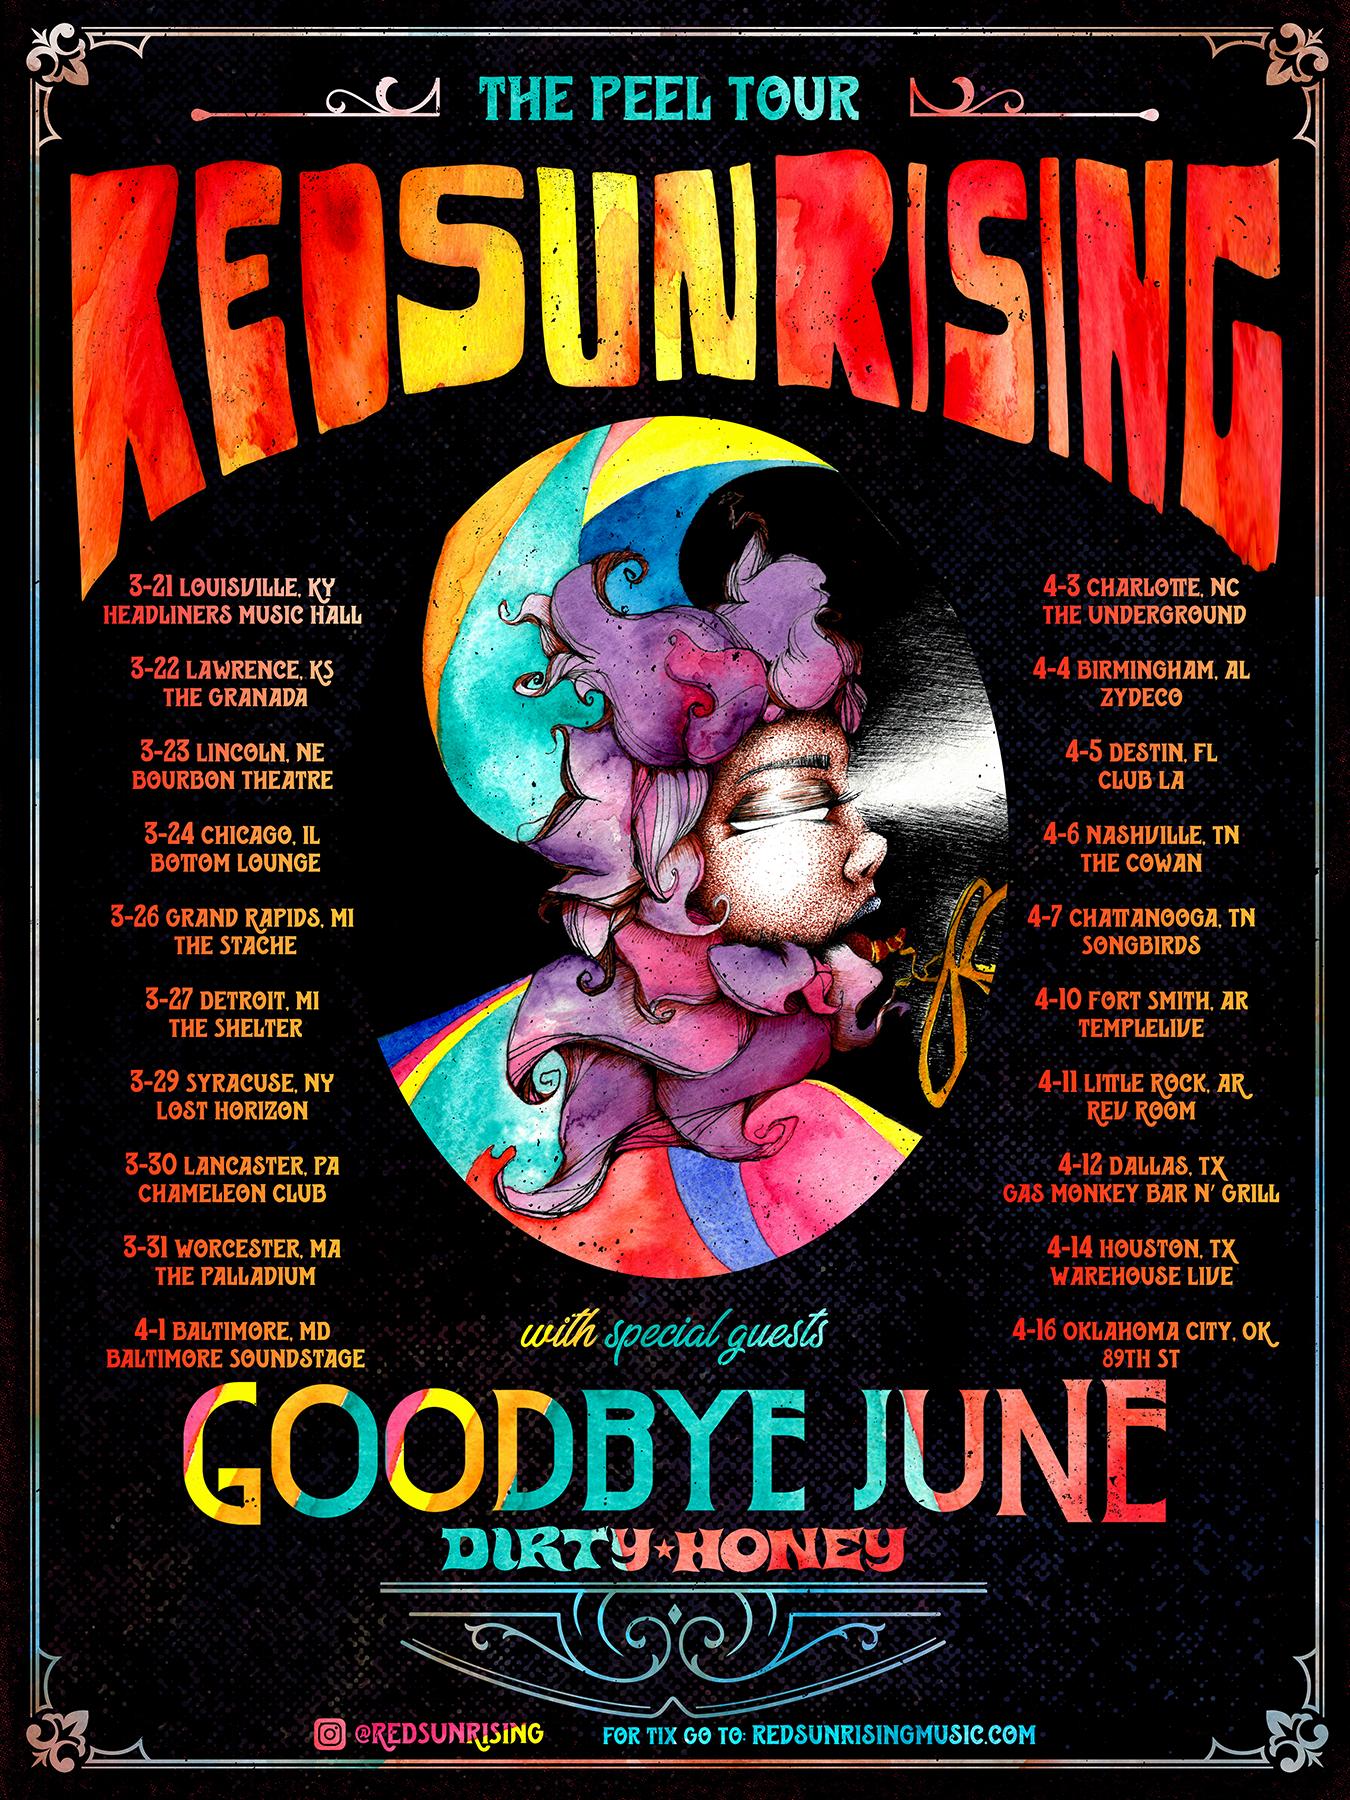 RSR Peel Tour.jpg